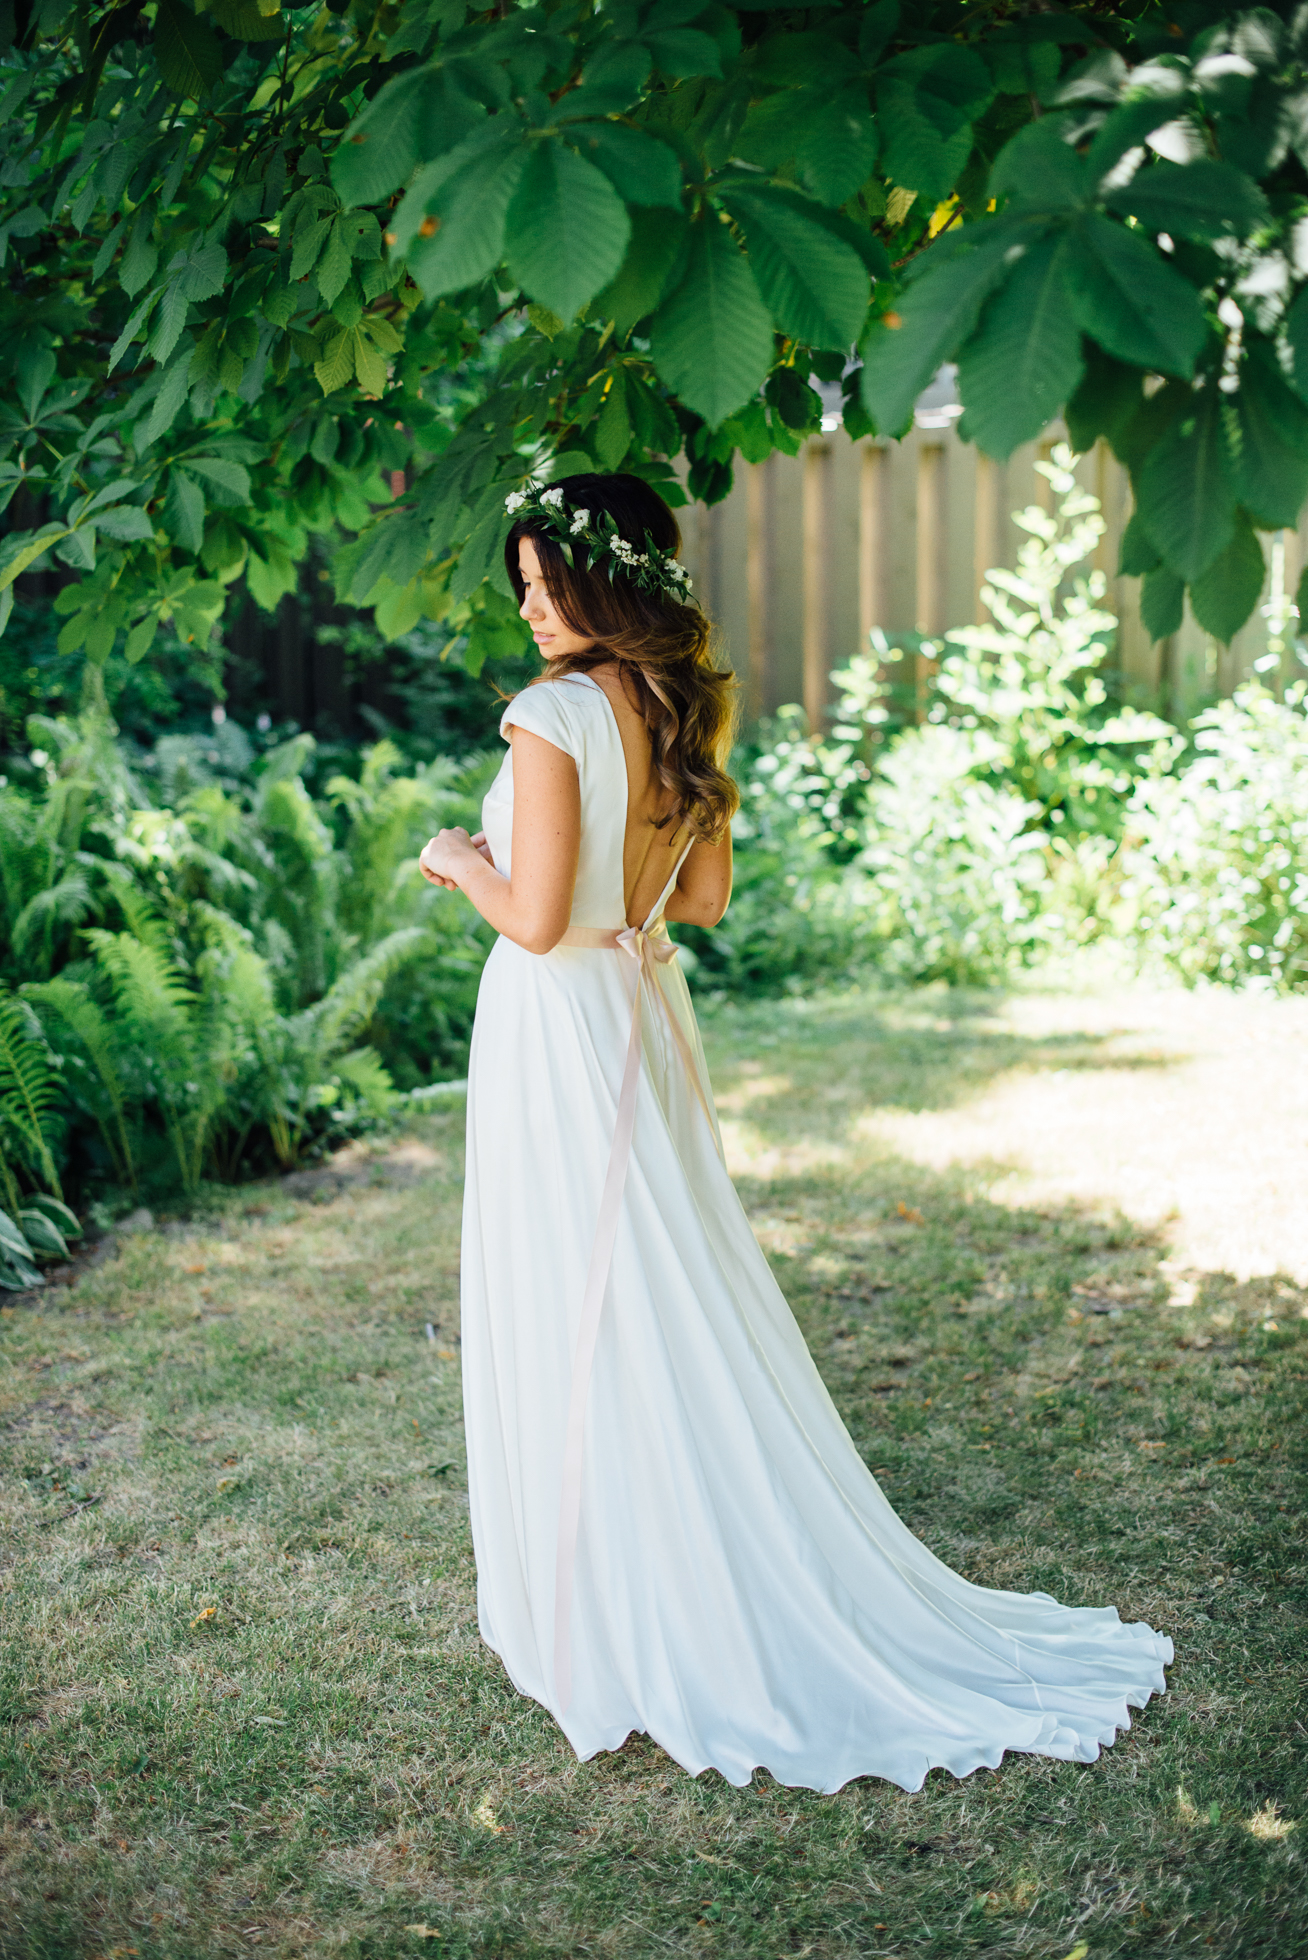 Downswell-Barn-Wedding-Photography-17.jpg